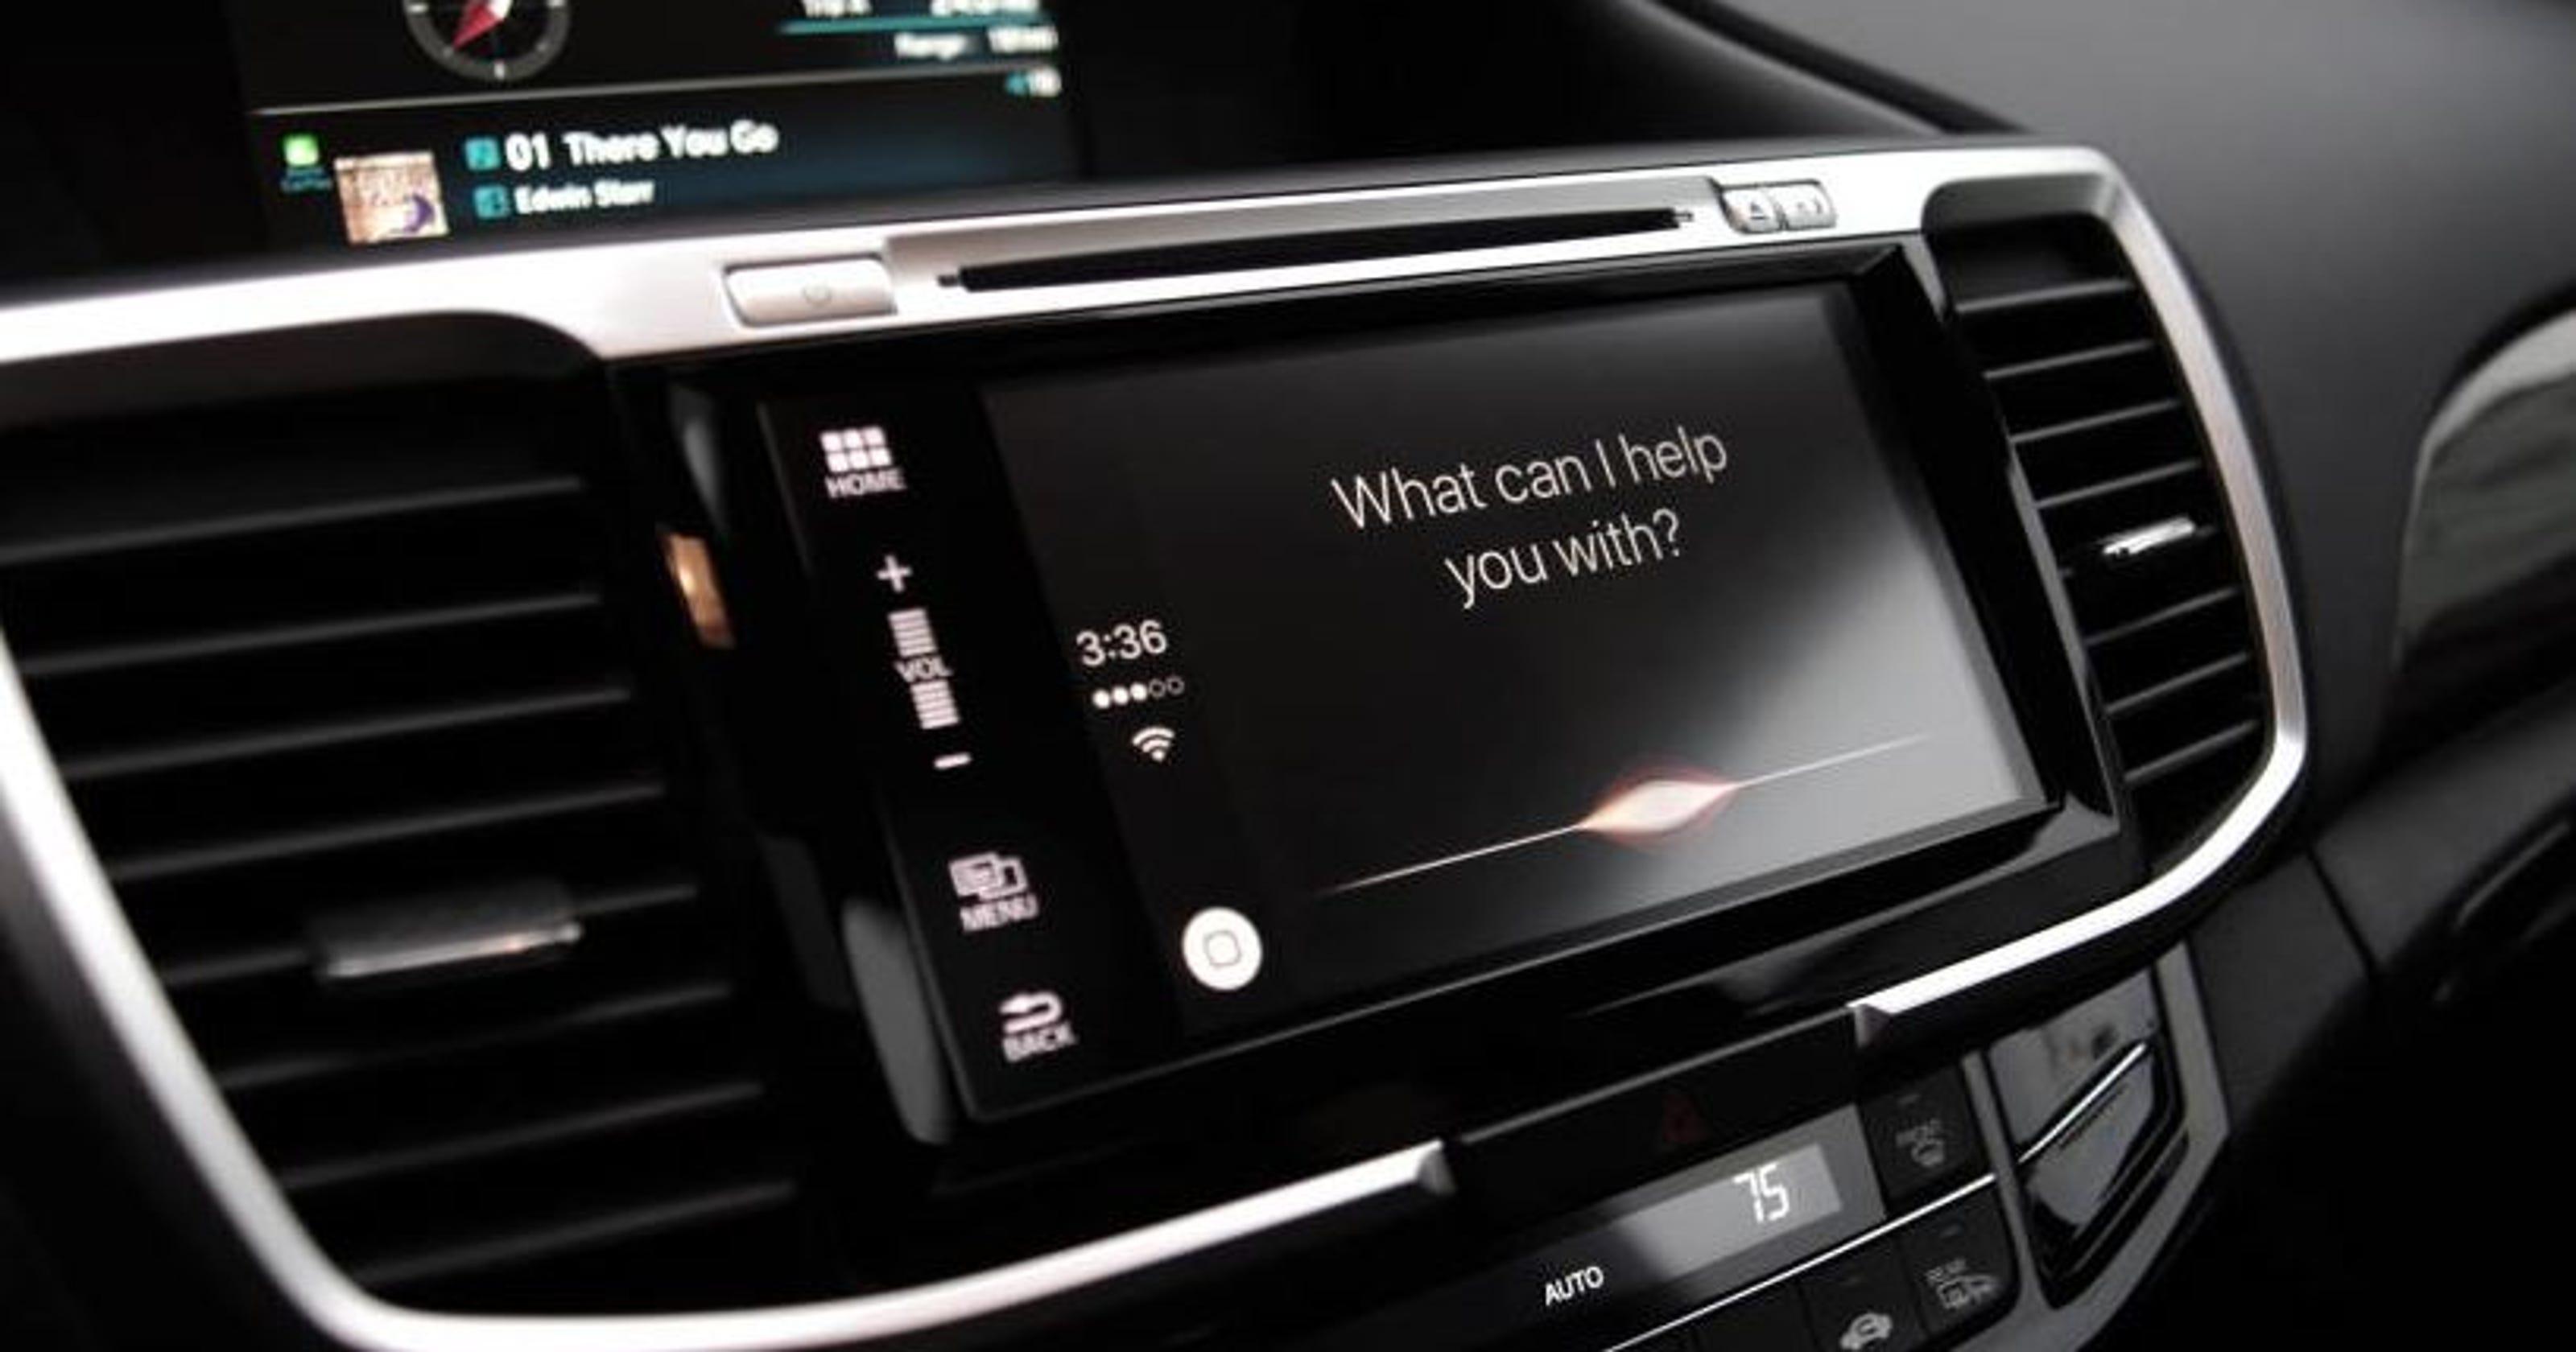 Honda Accord wins with Apple CarPlay, Android Auto